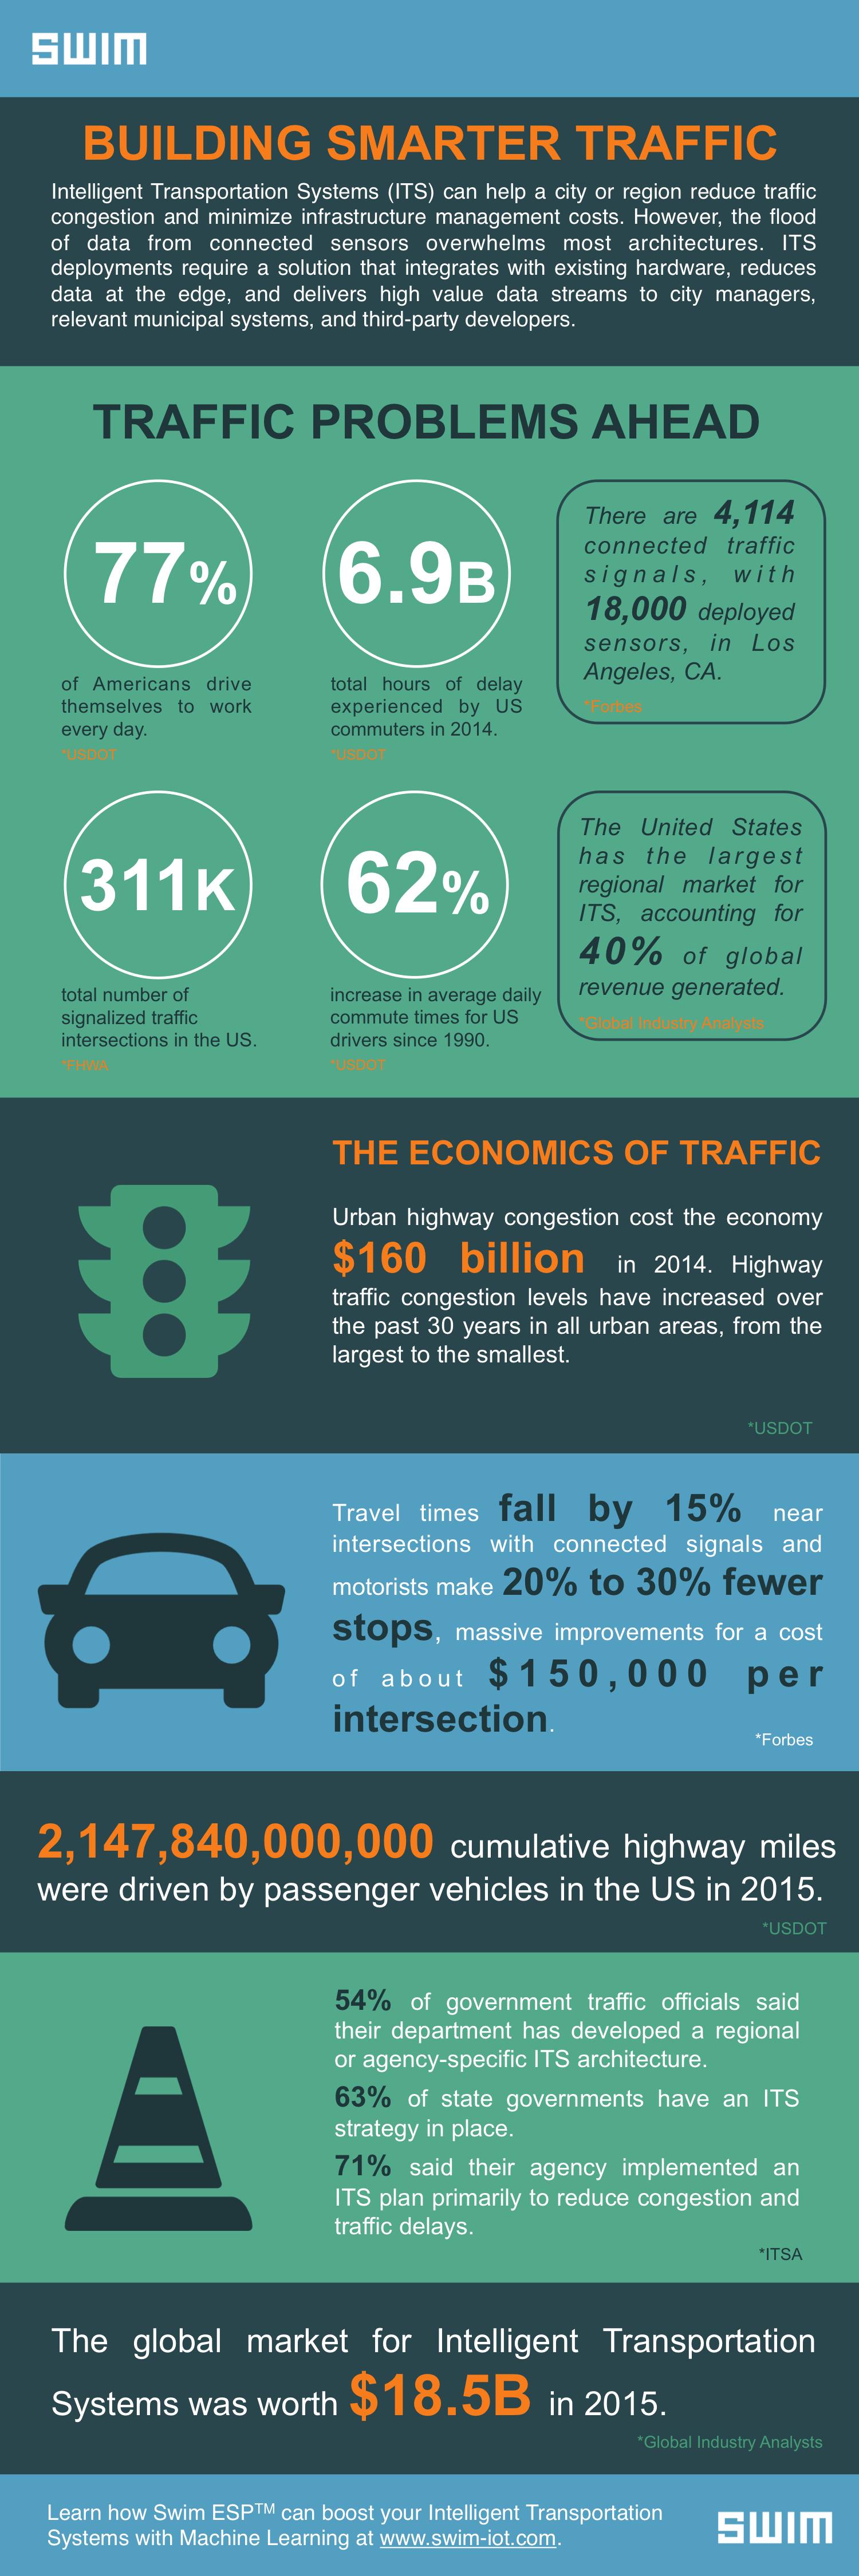 Swim_Building Smarter Traffic-Traffic Statistics_Infographic